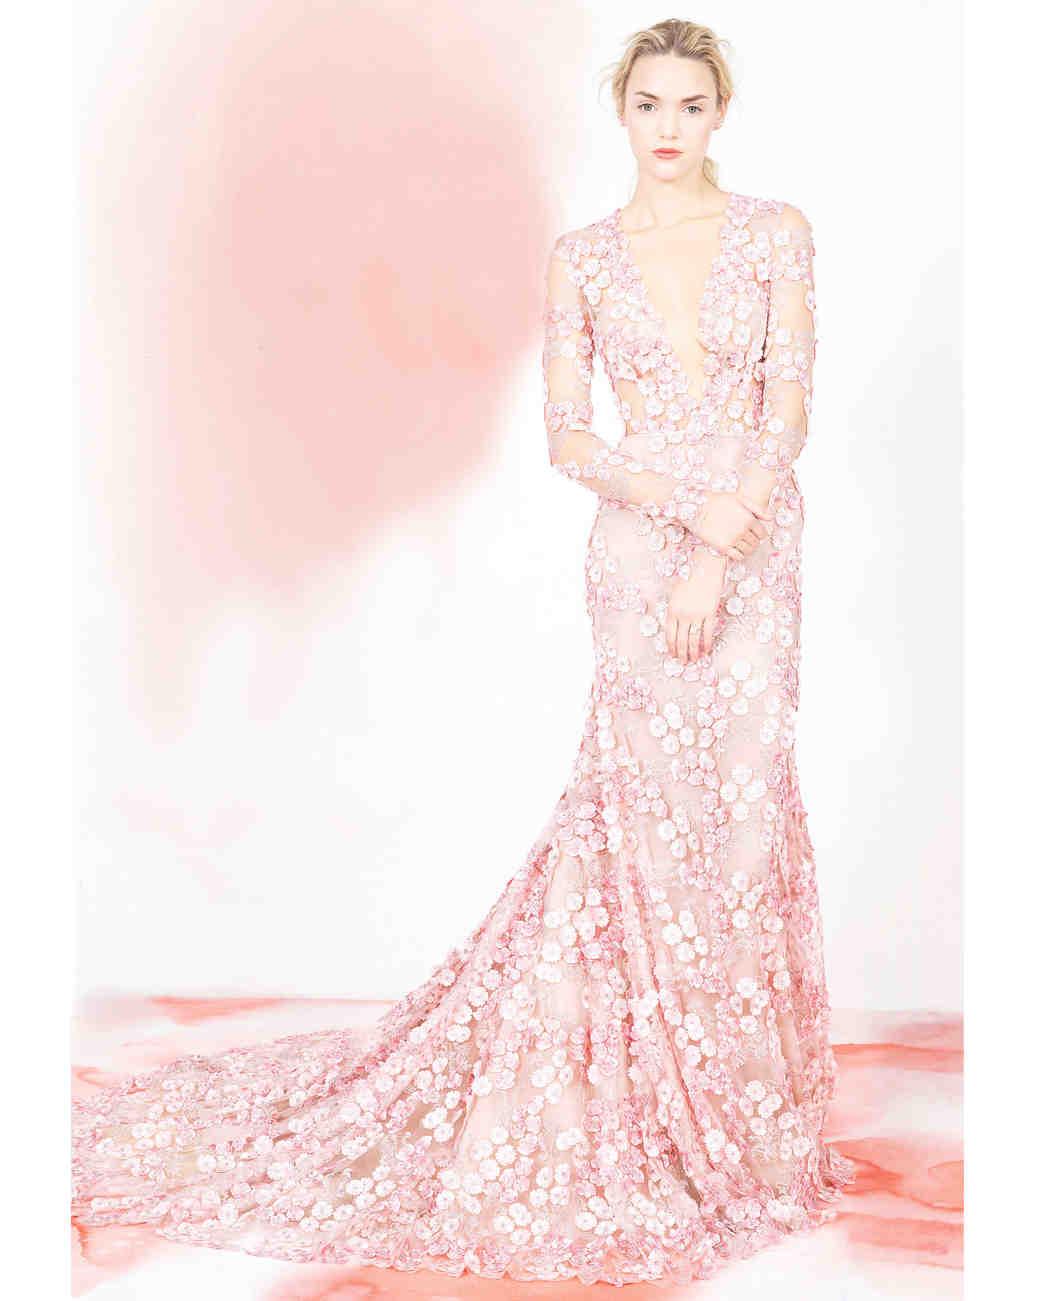 mnaeem-khan-beaded-lace-baby-pink-dress-70-d112700.jpg